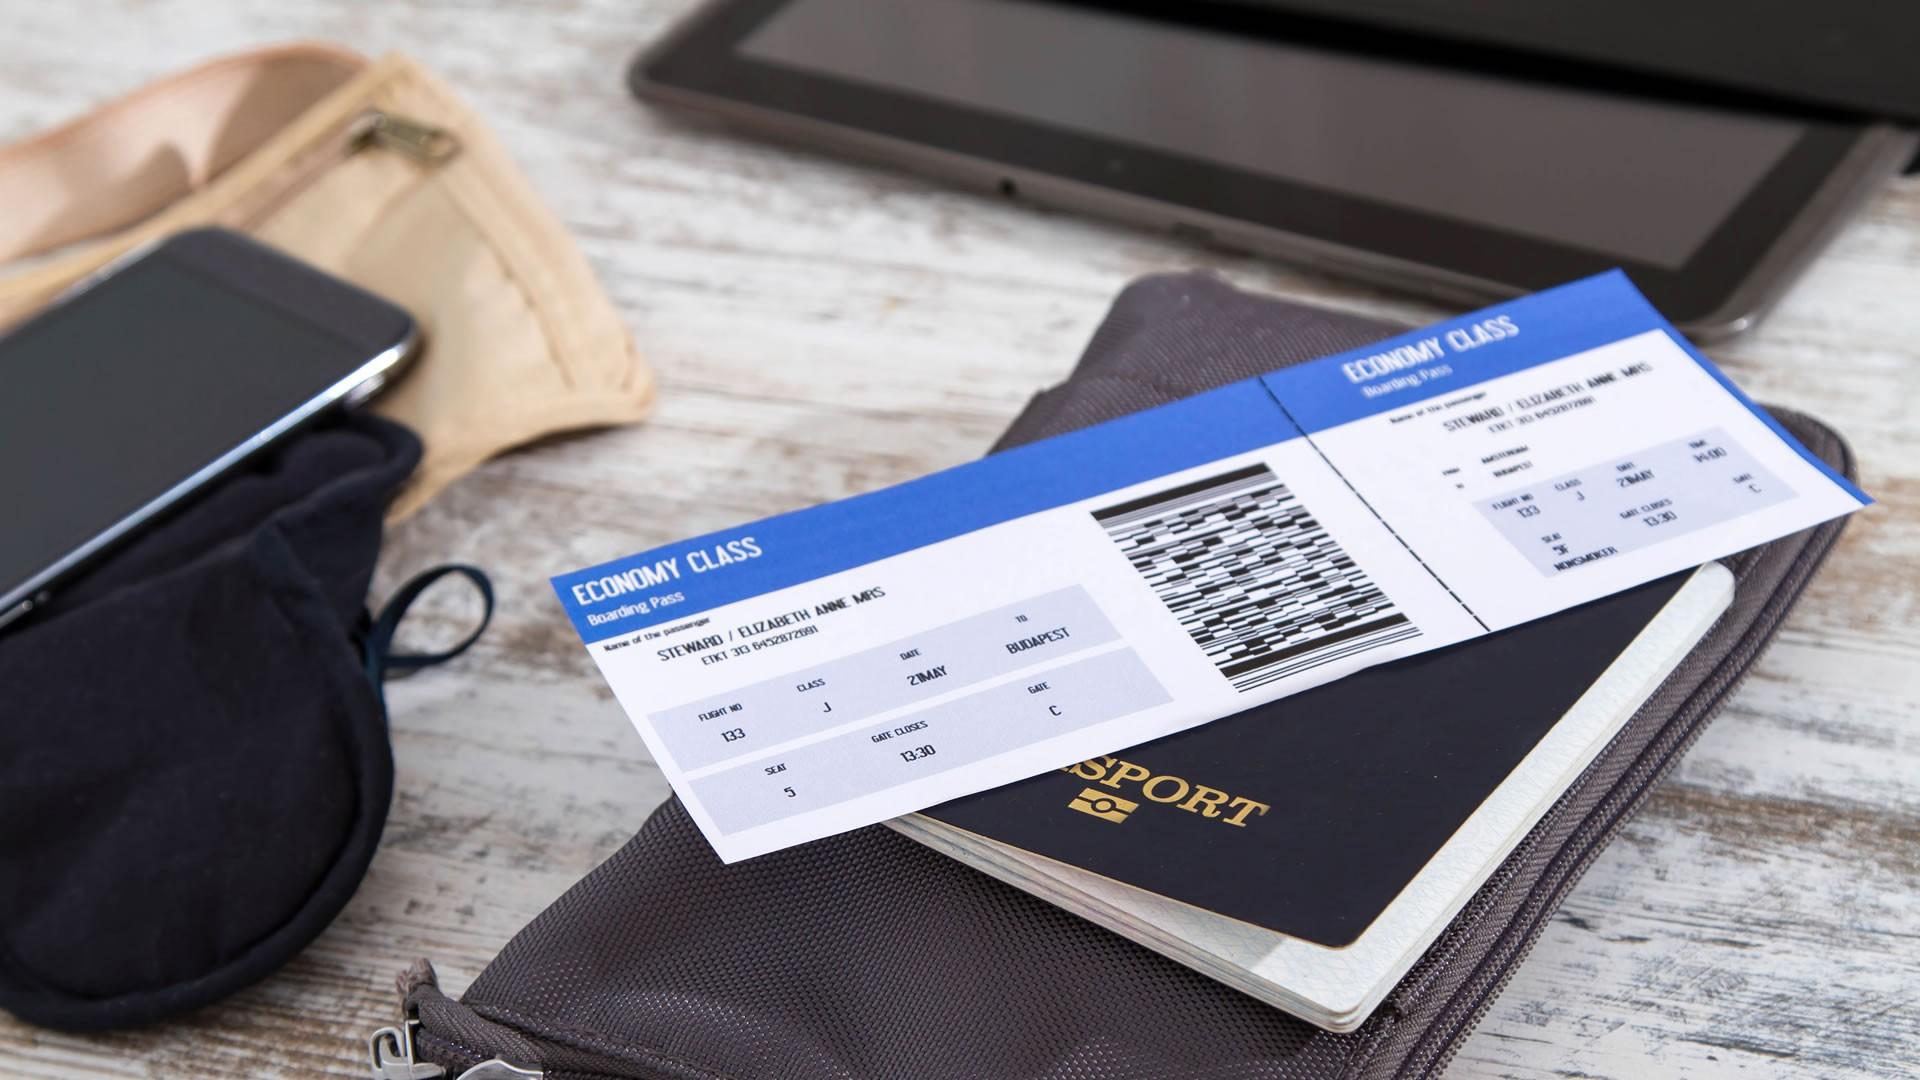 Картинки авиабилеты онлайн, открытка фон